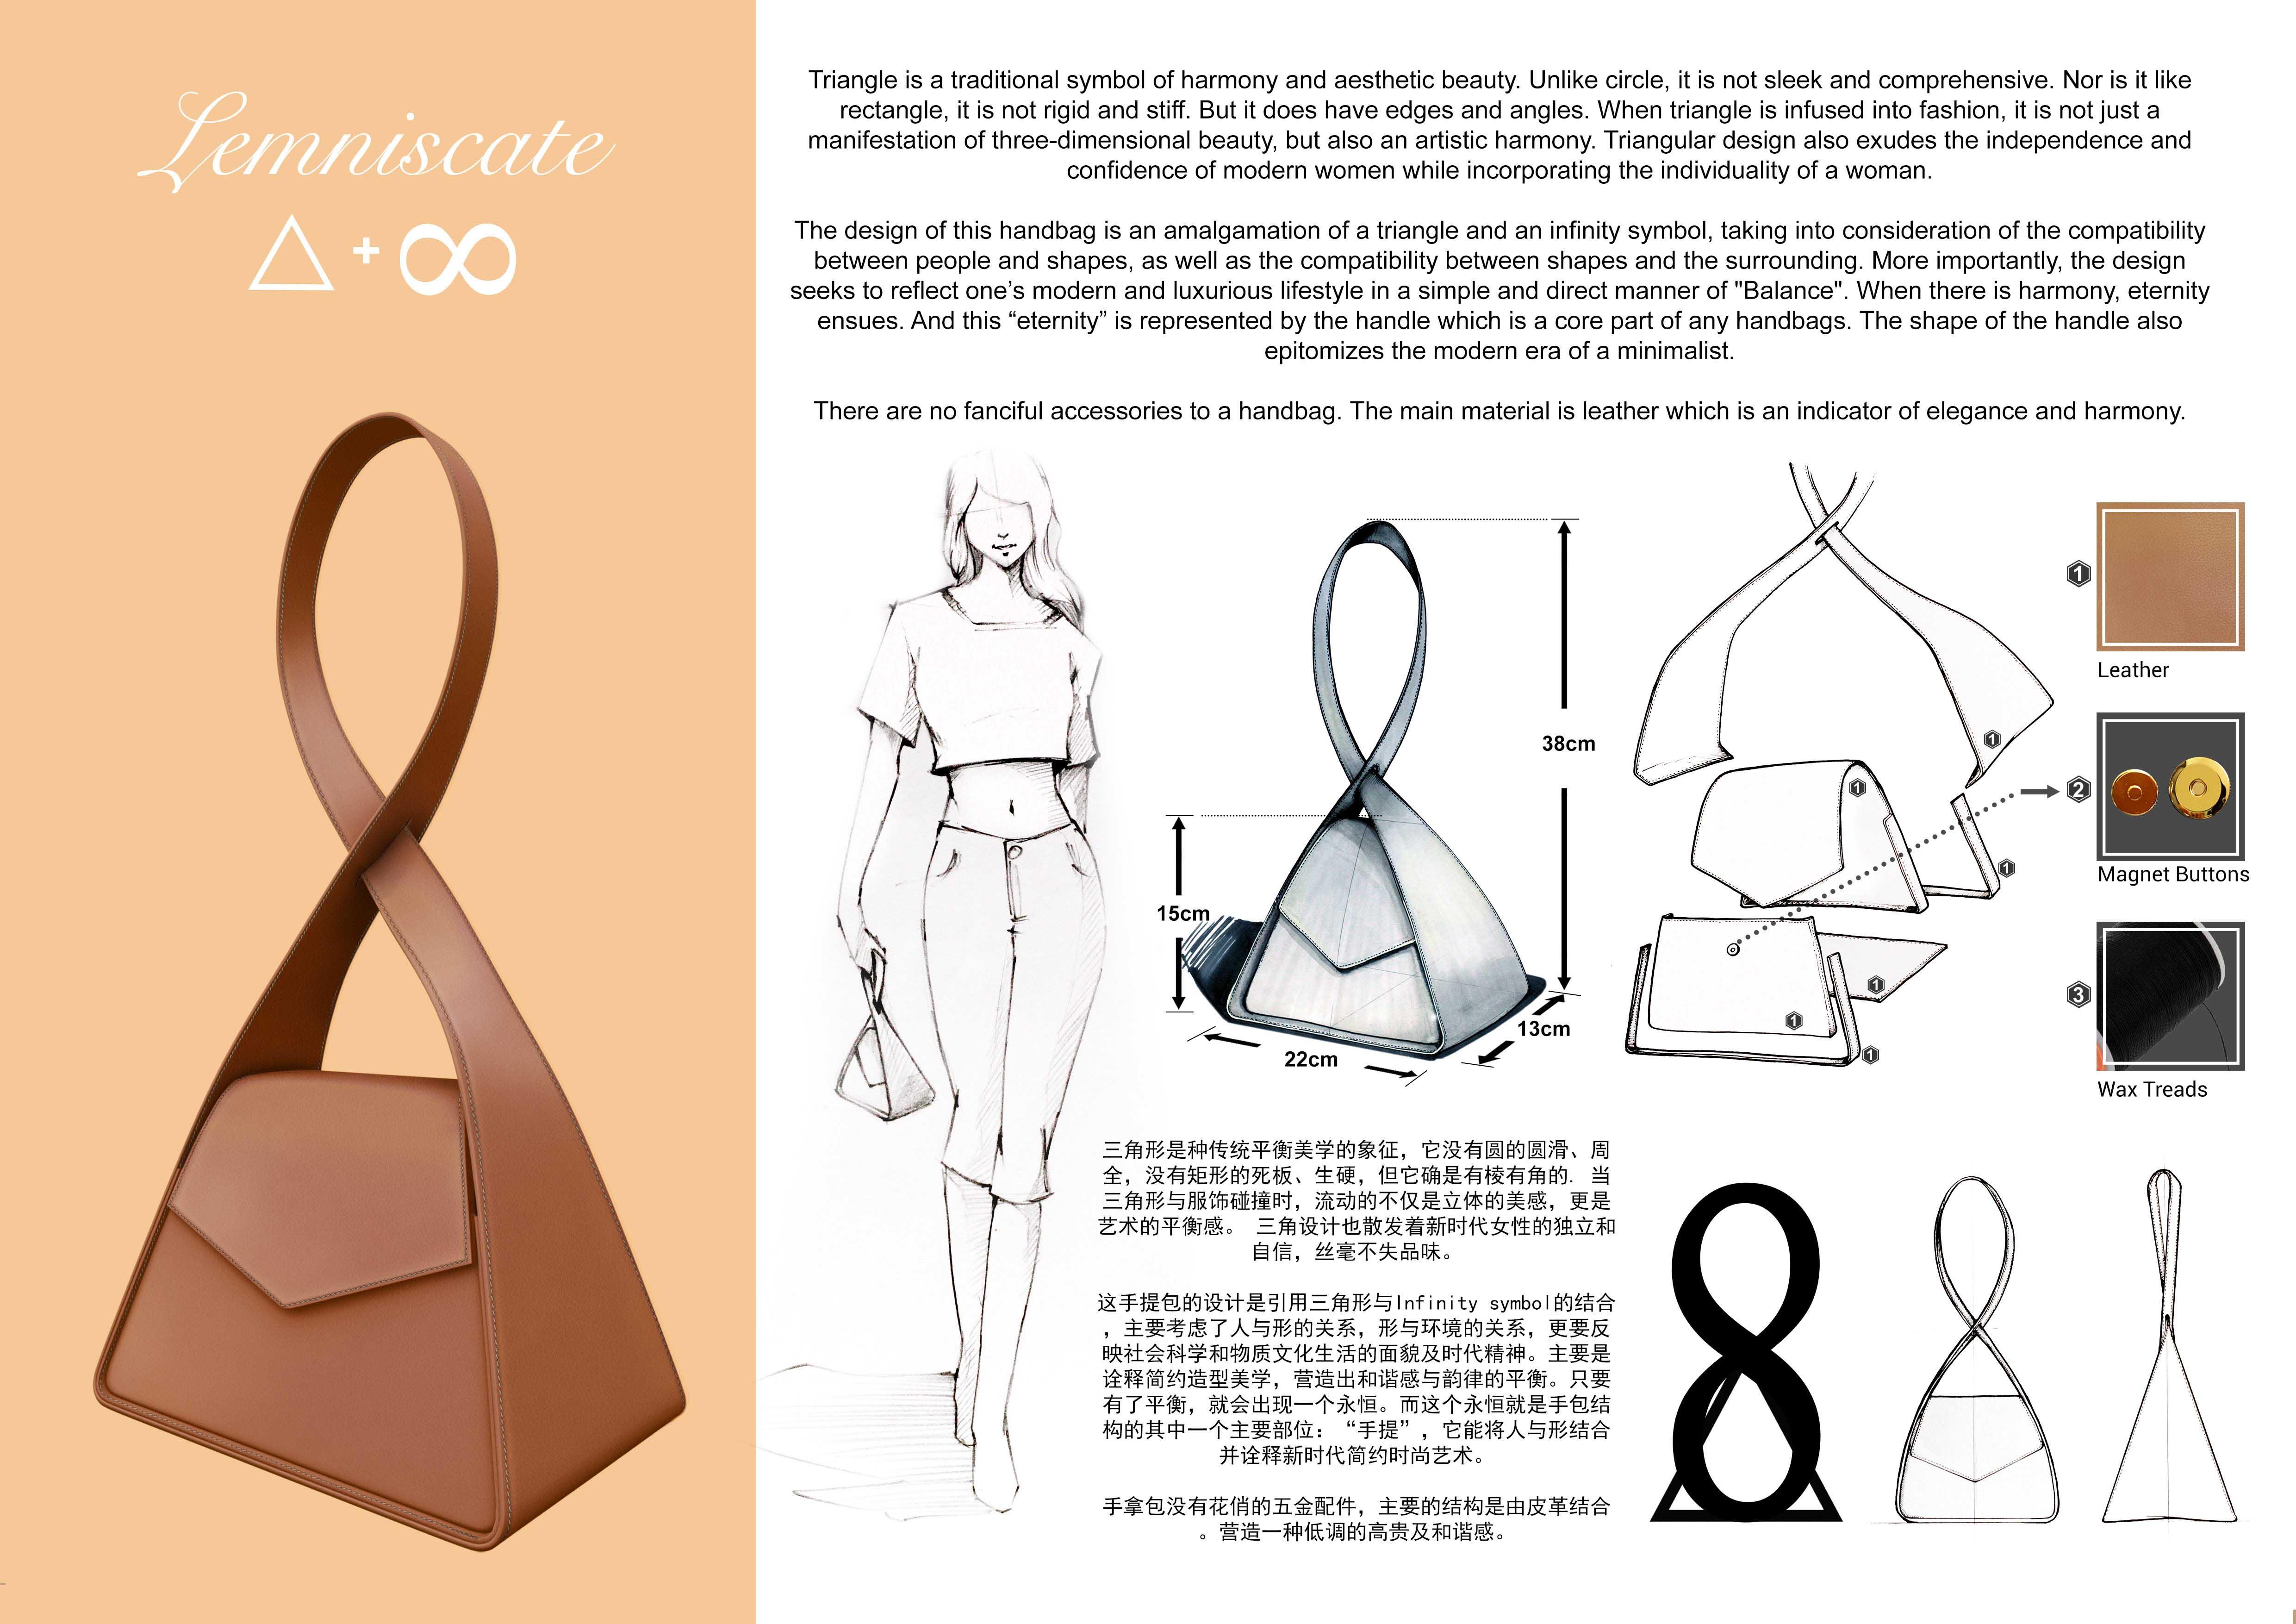 WINNER Leminscate Handbag By Ho Kuan Teck